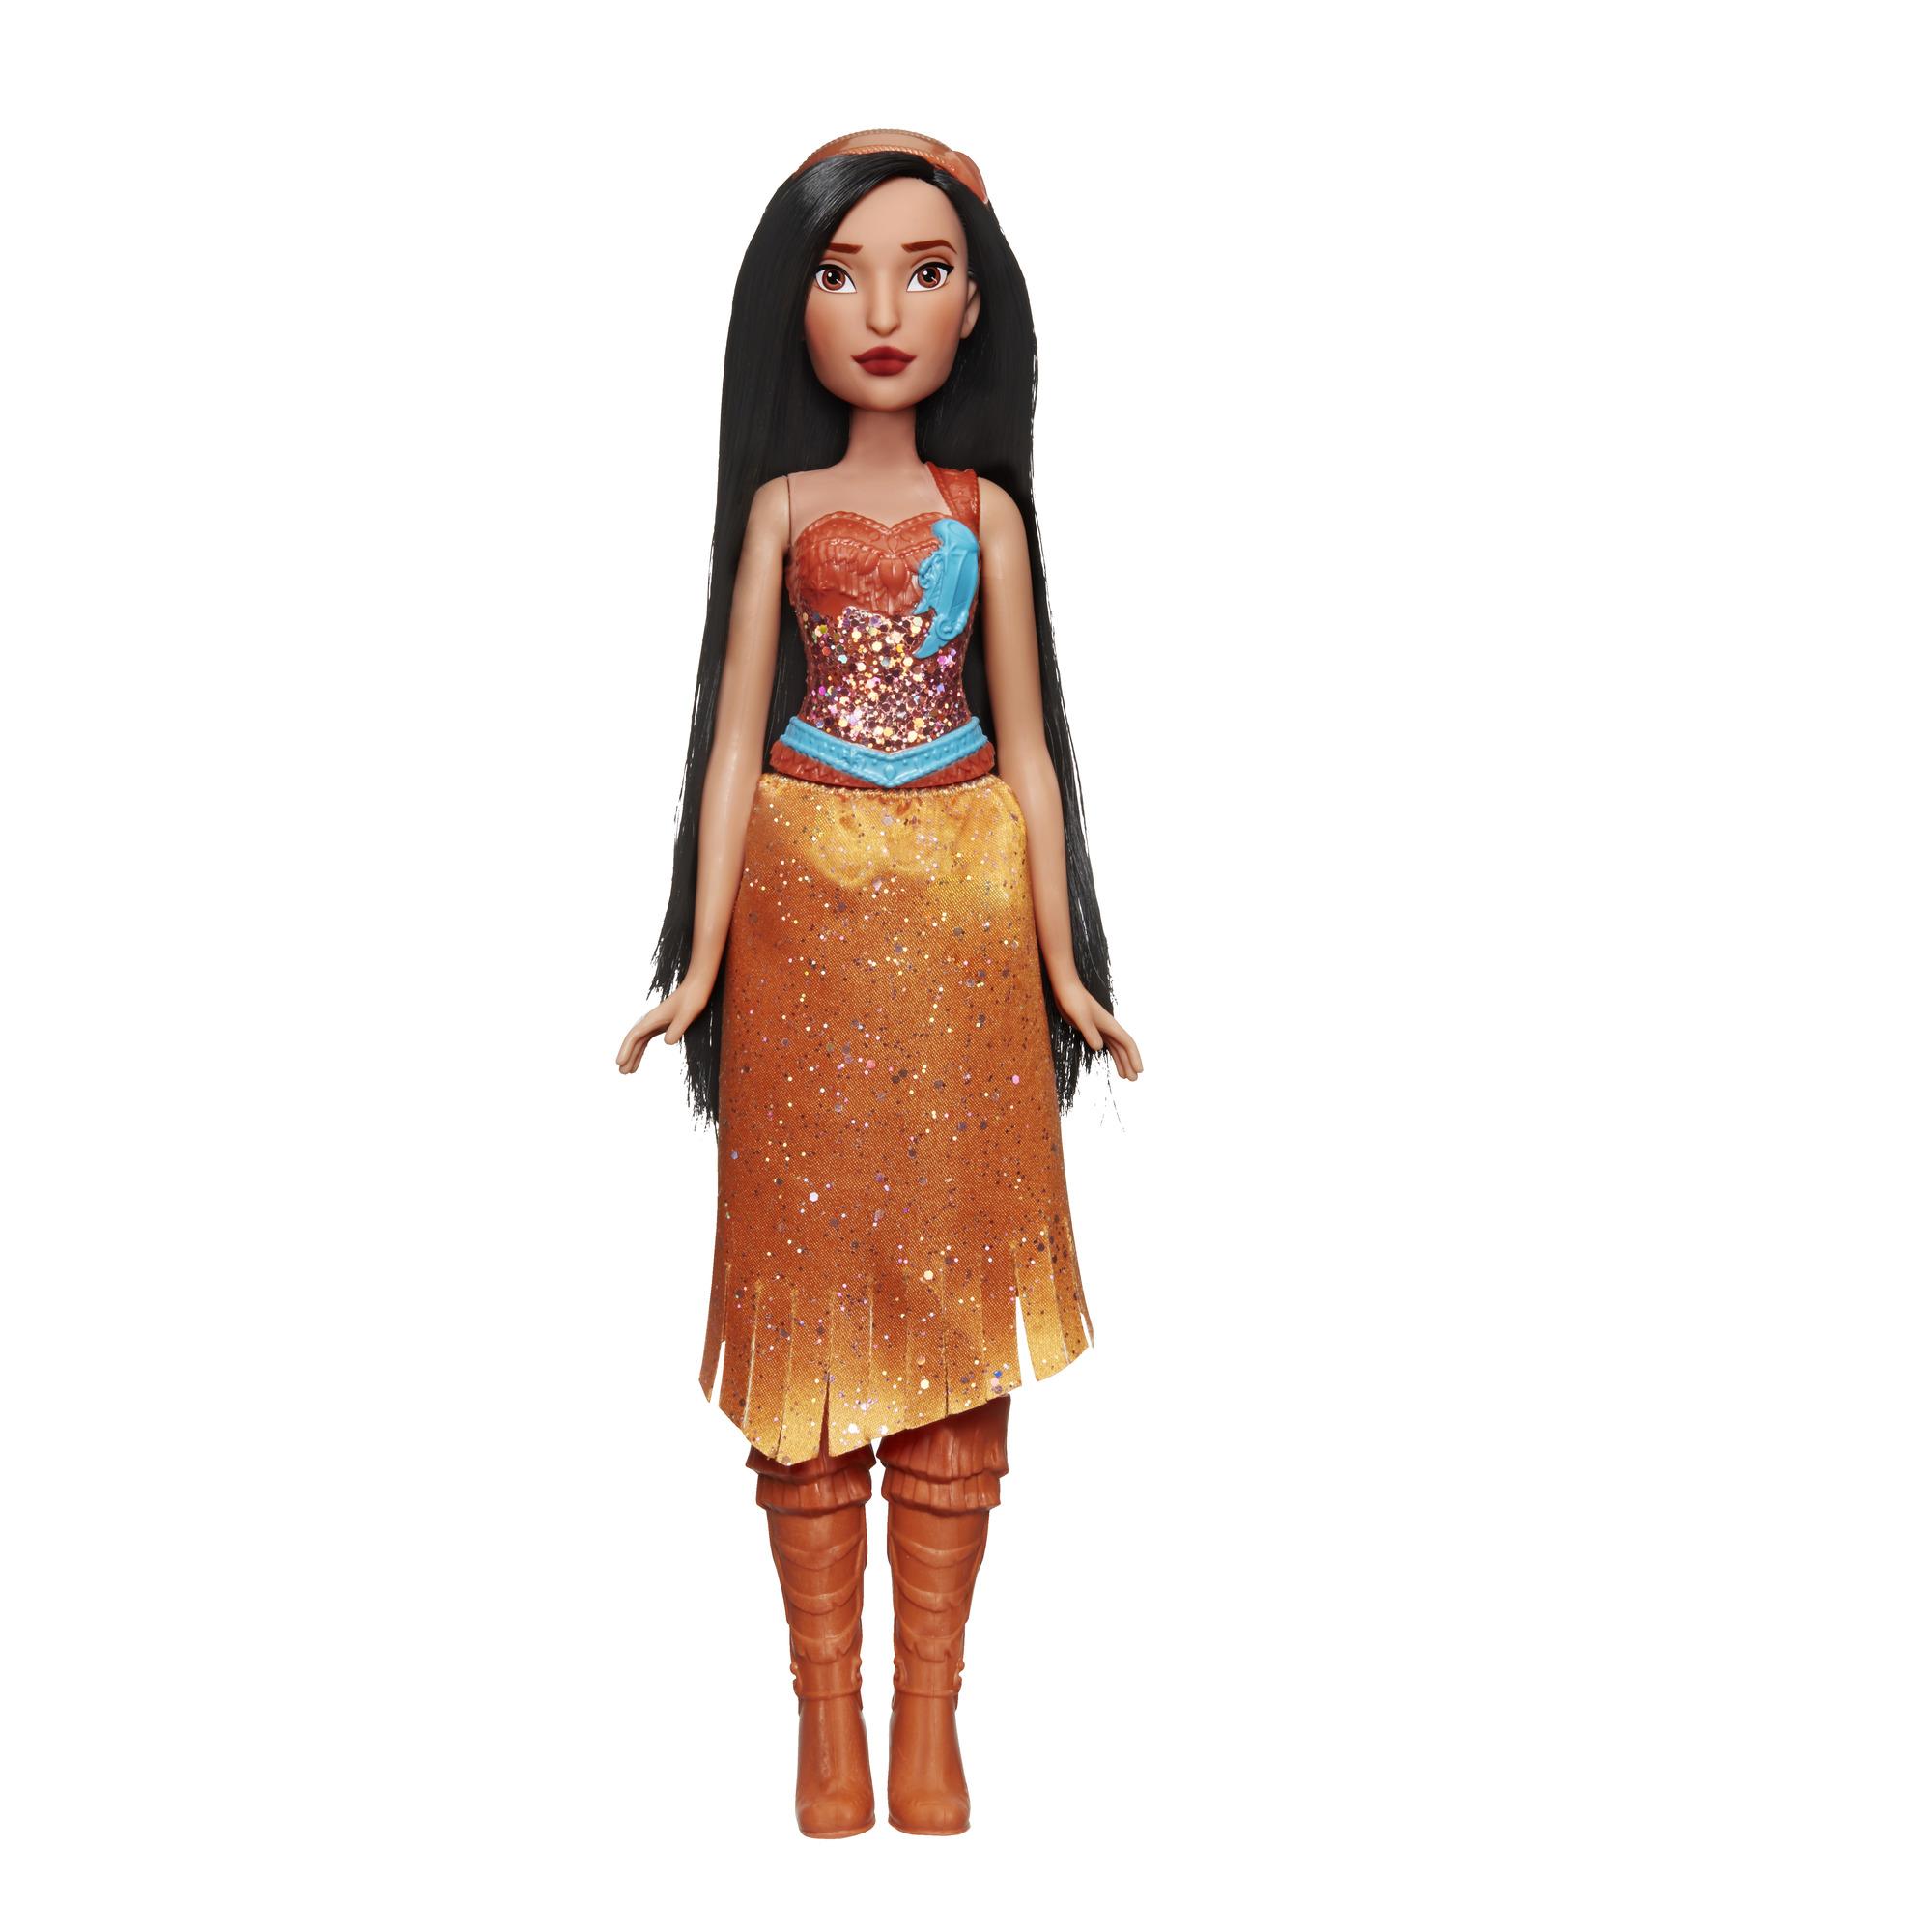 בובת הנסיכה פוקהונטס – נסיכות דיסני